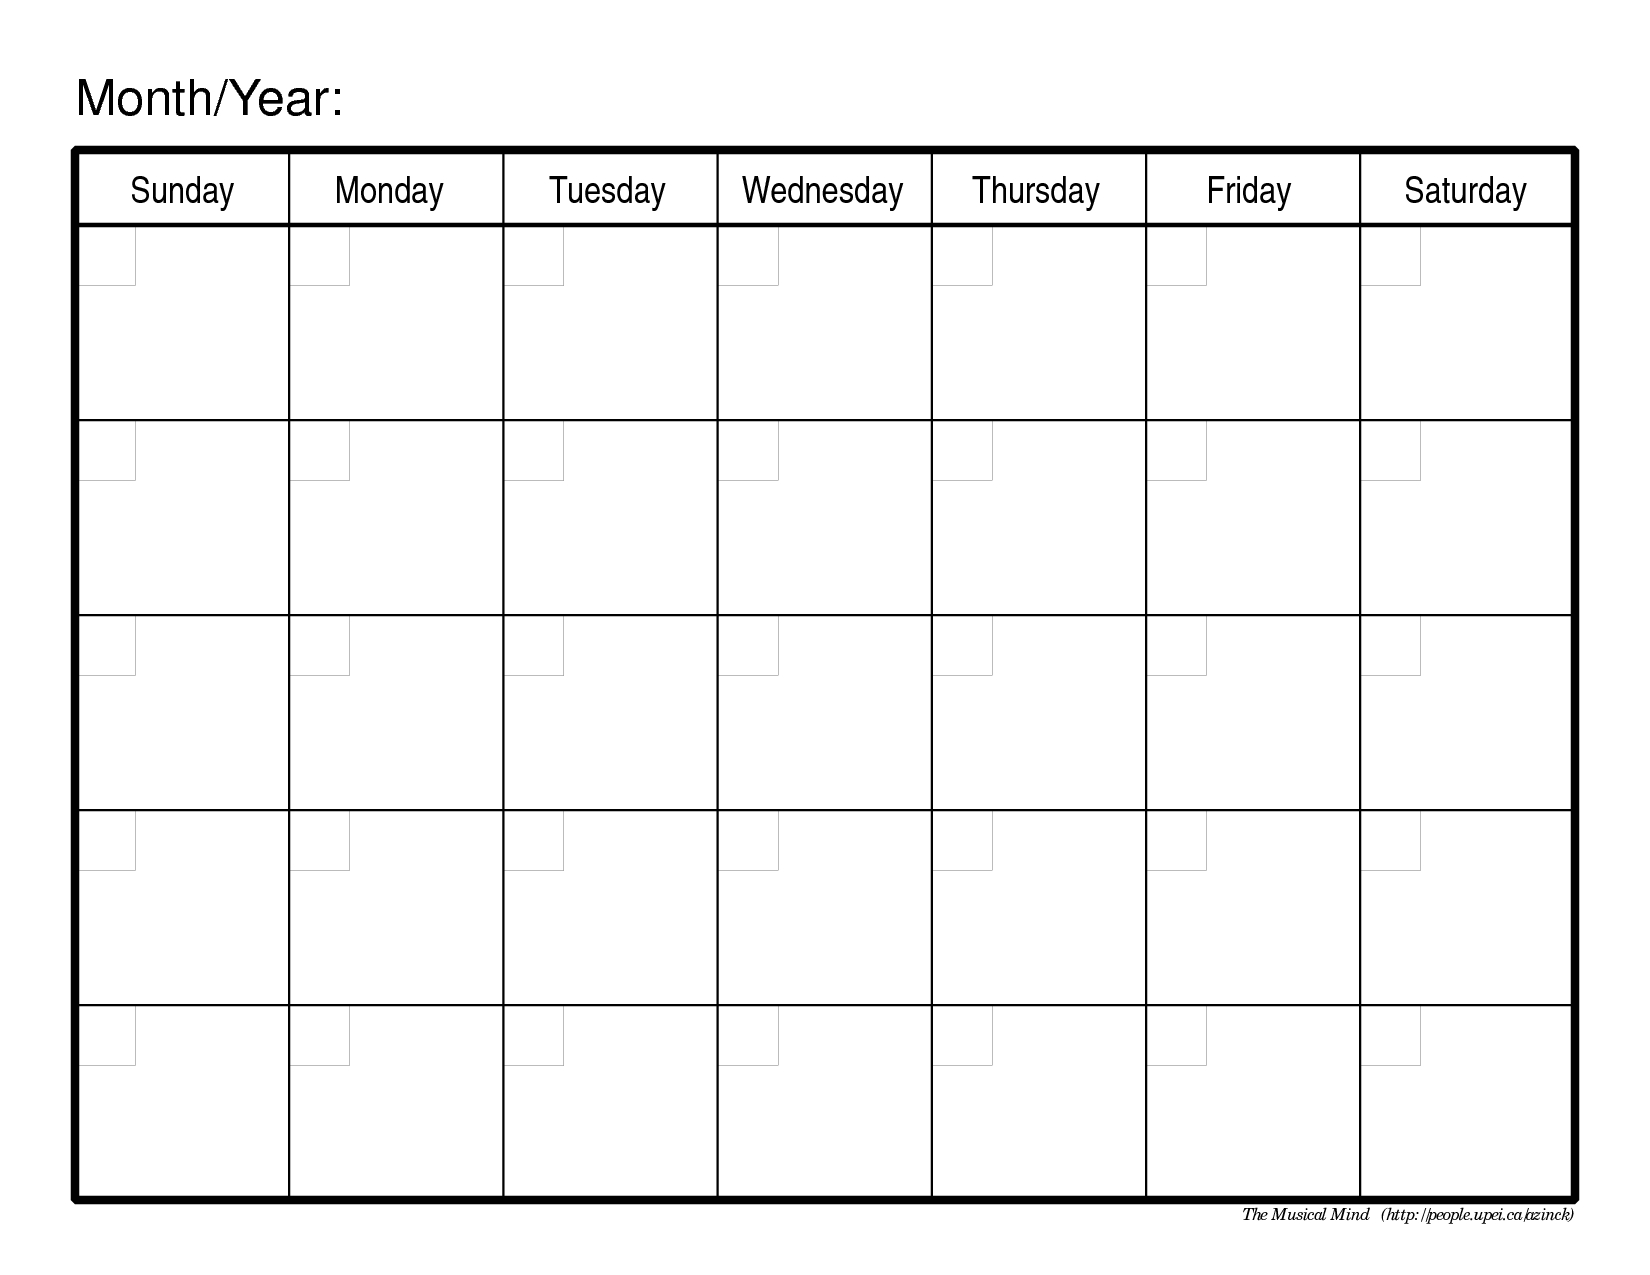 Monthly Calendar Printable Yearly Calendar Printable  xjb